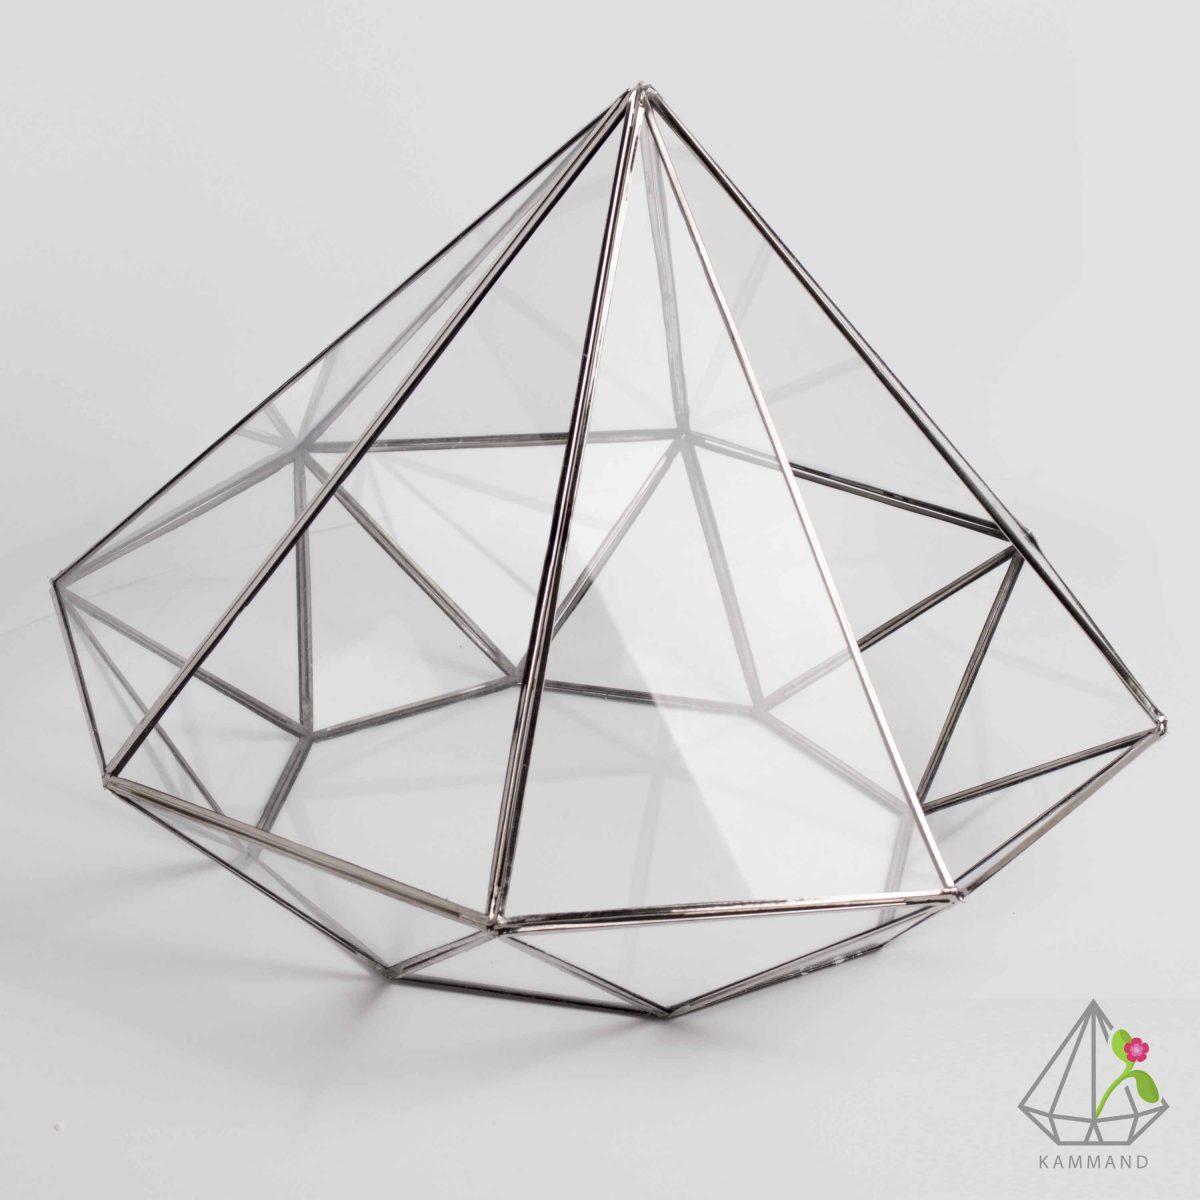 ظروف تراریوم، تراریوم چند وجهی ، تراریوم الماس ،گلدان شیشه ای، تراریوم، باغ شیشه ای ، فروشگاه اینترنتی کمند